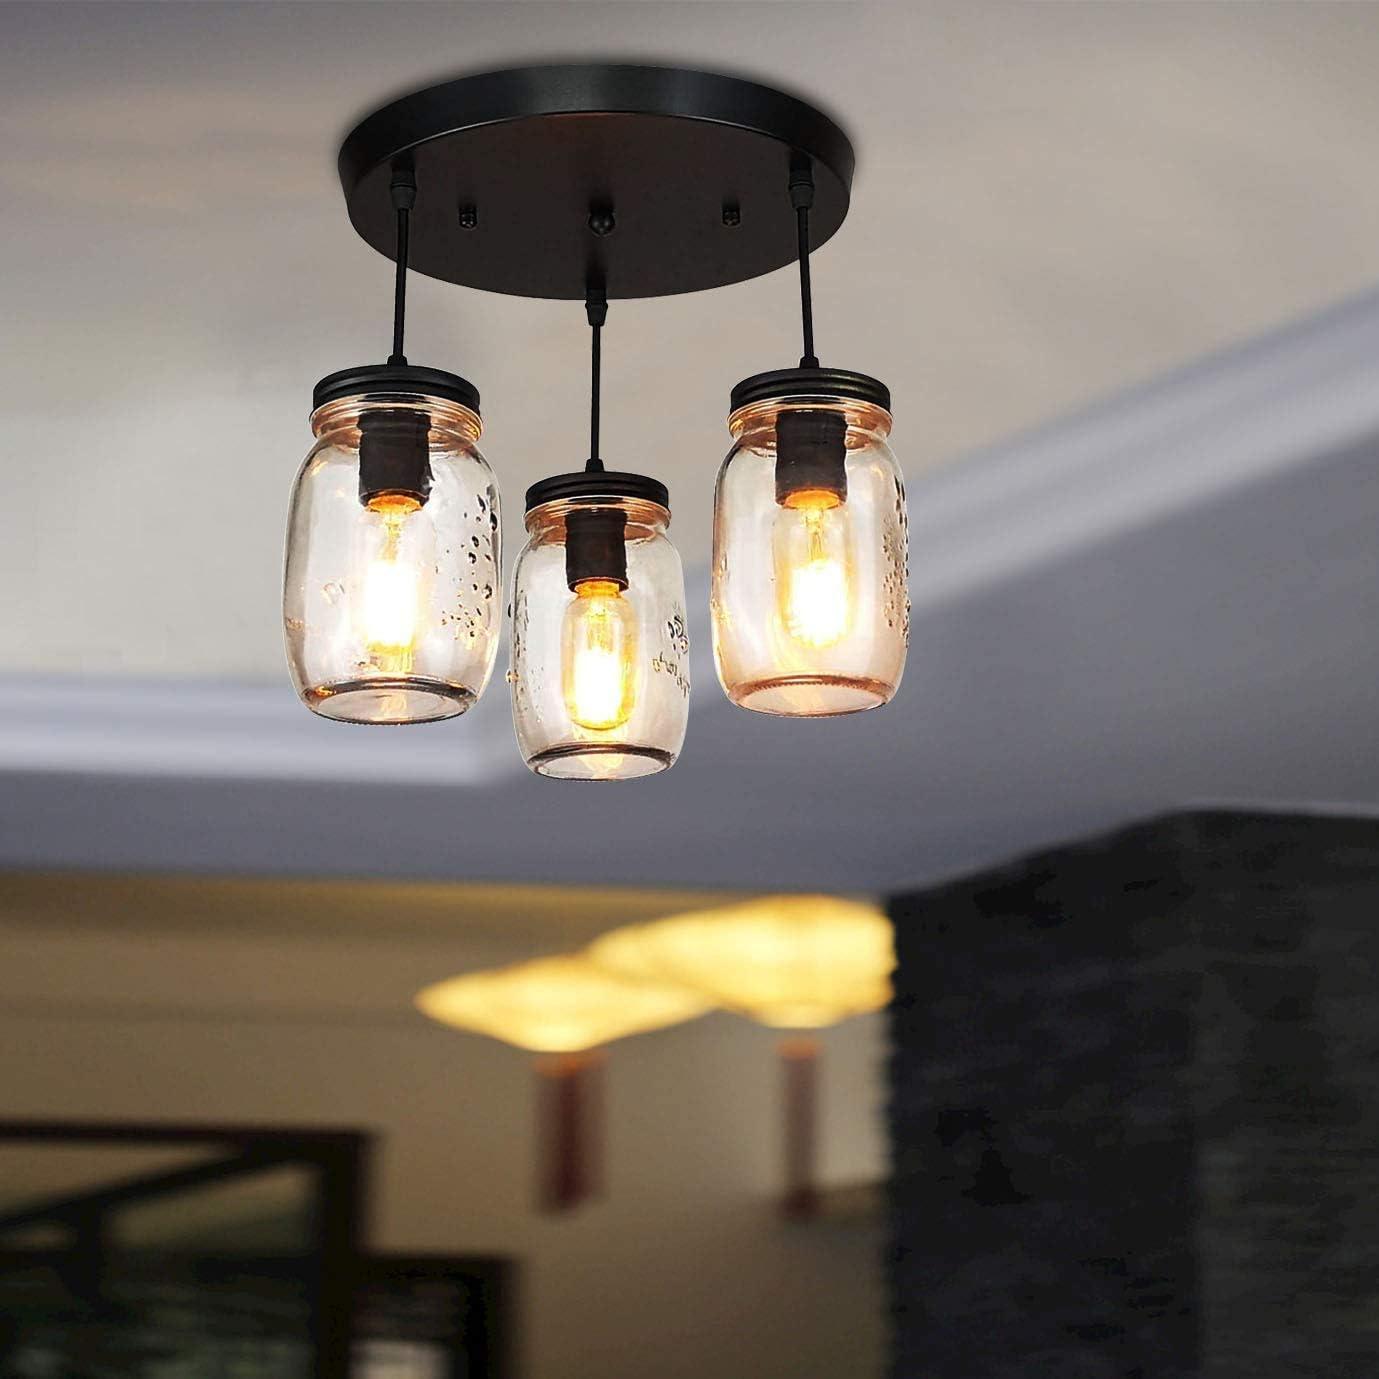 LONGWIND Semi Flush Mount Ceiling Light Fixture with Clear Glass Shade,3 Lights Farmhouse Mason Jar Pendant Lighting for Kitchen Island Bedroom